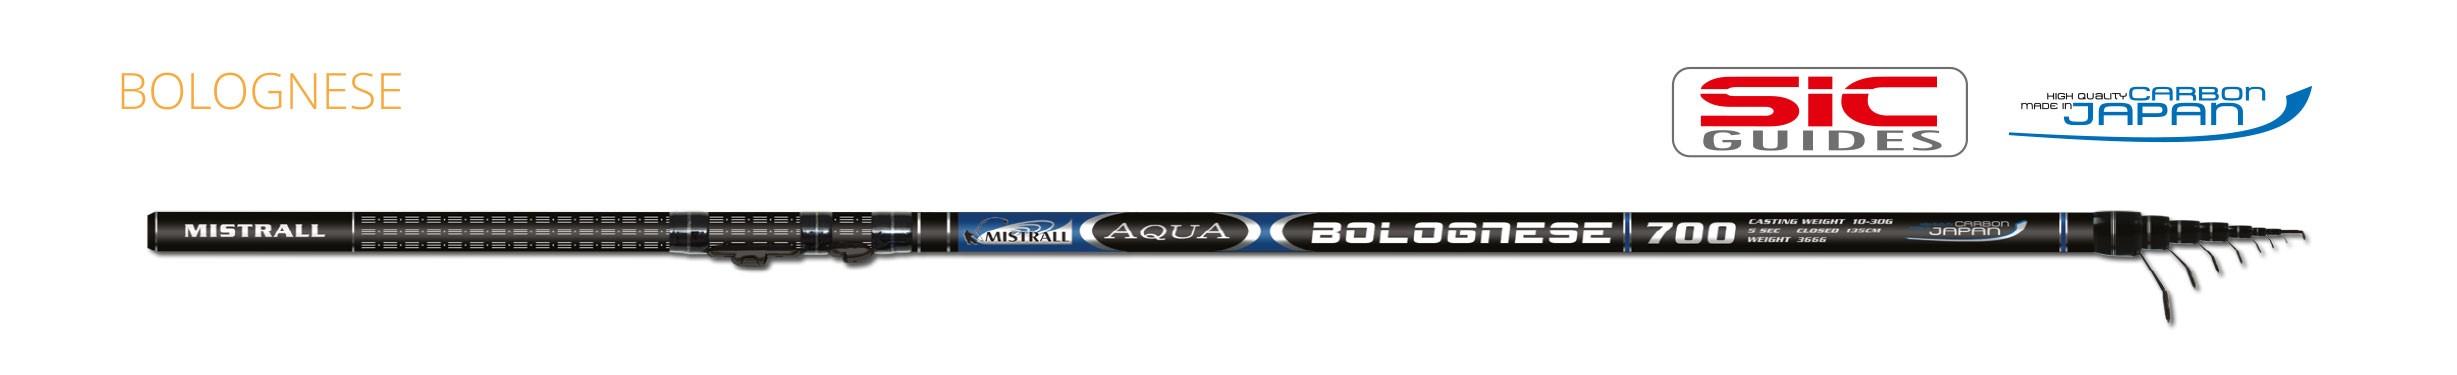 Mistrall prut aqua bolognese, 7 m